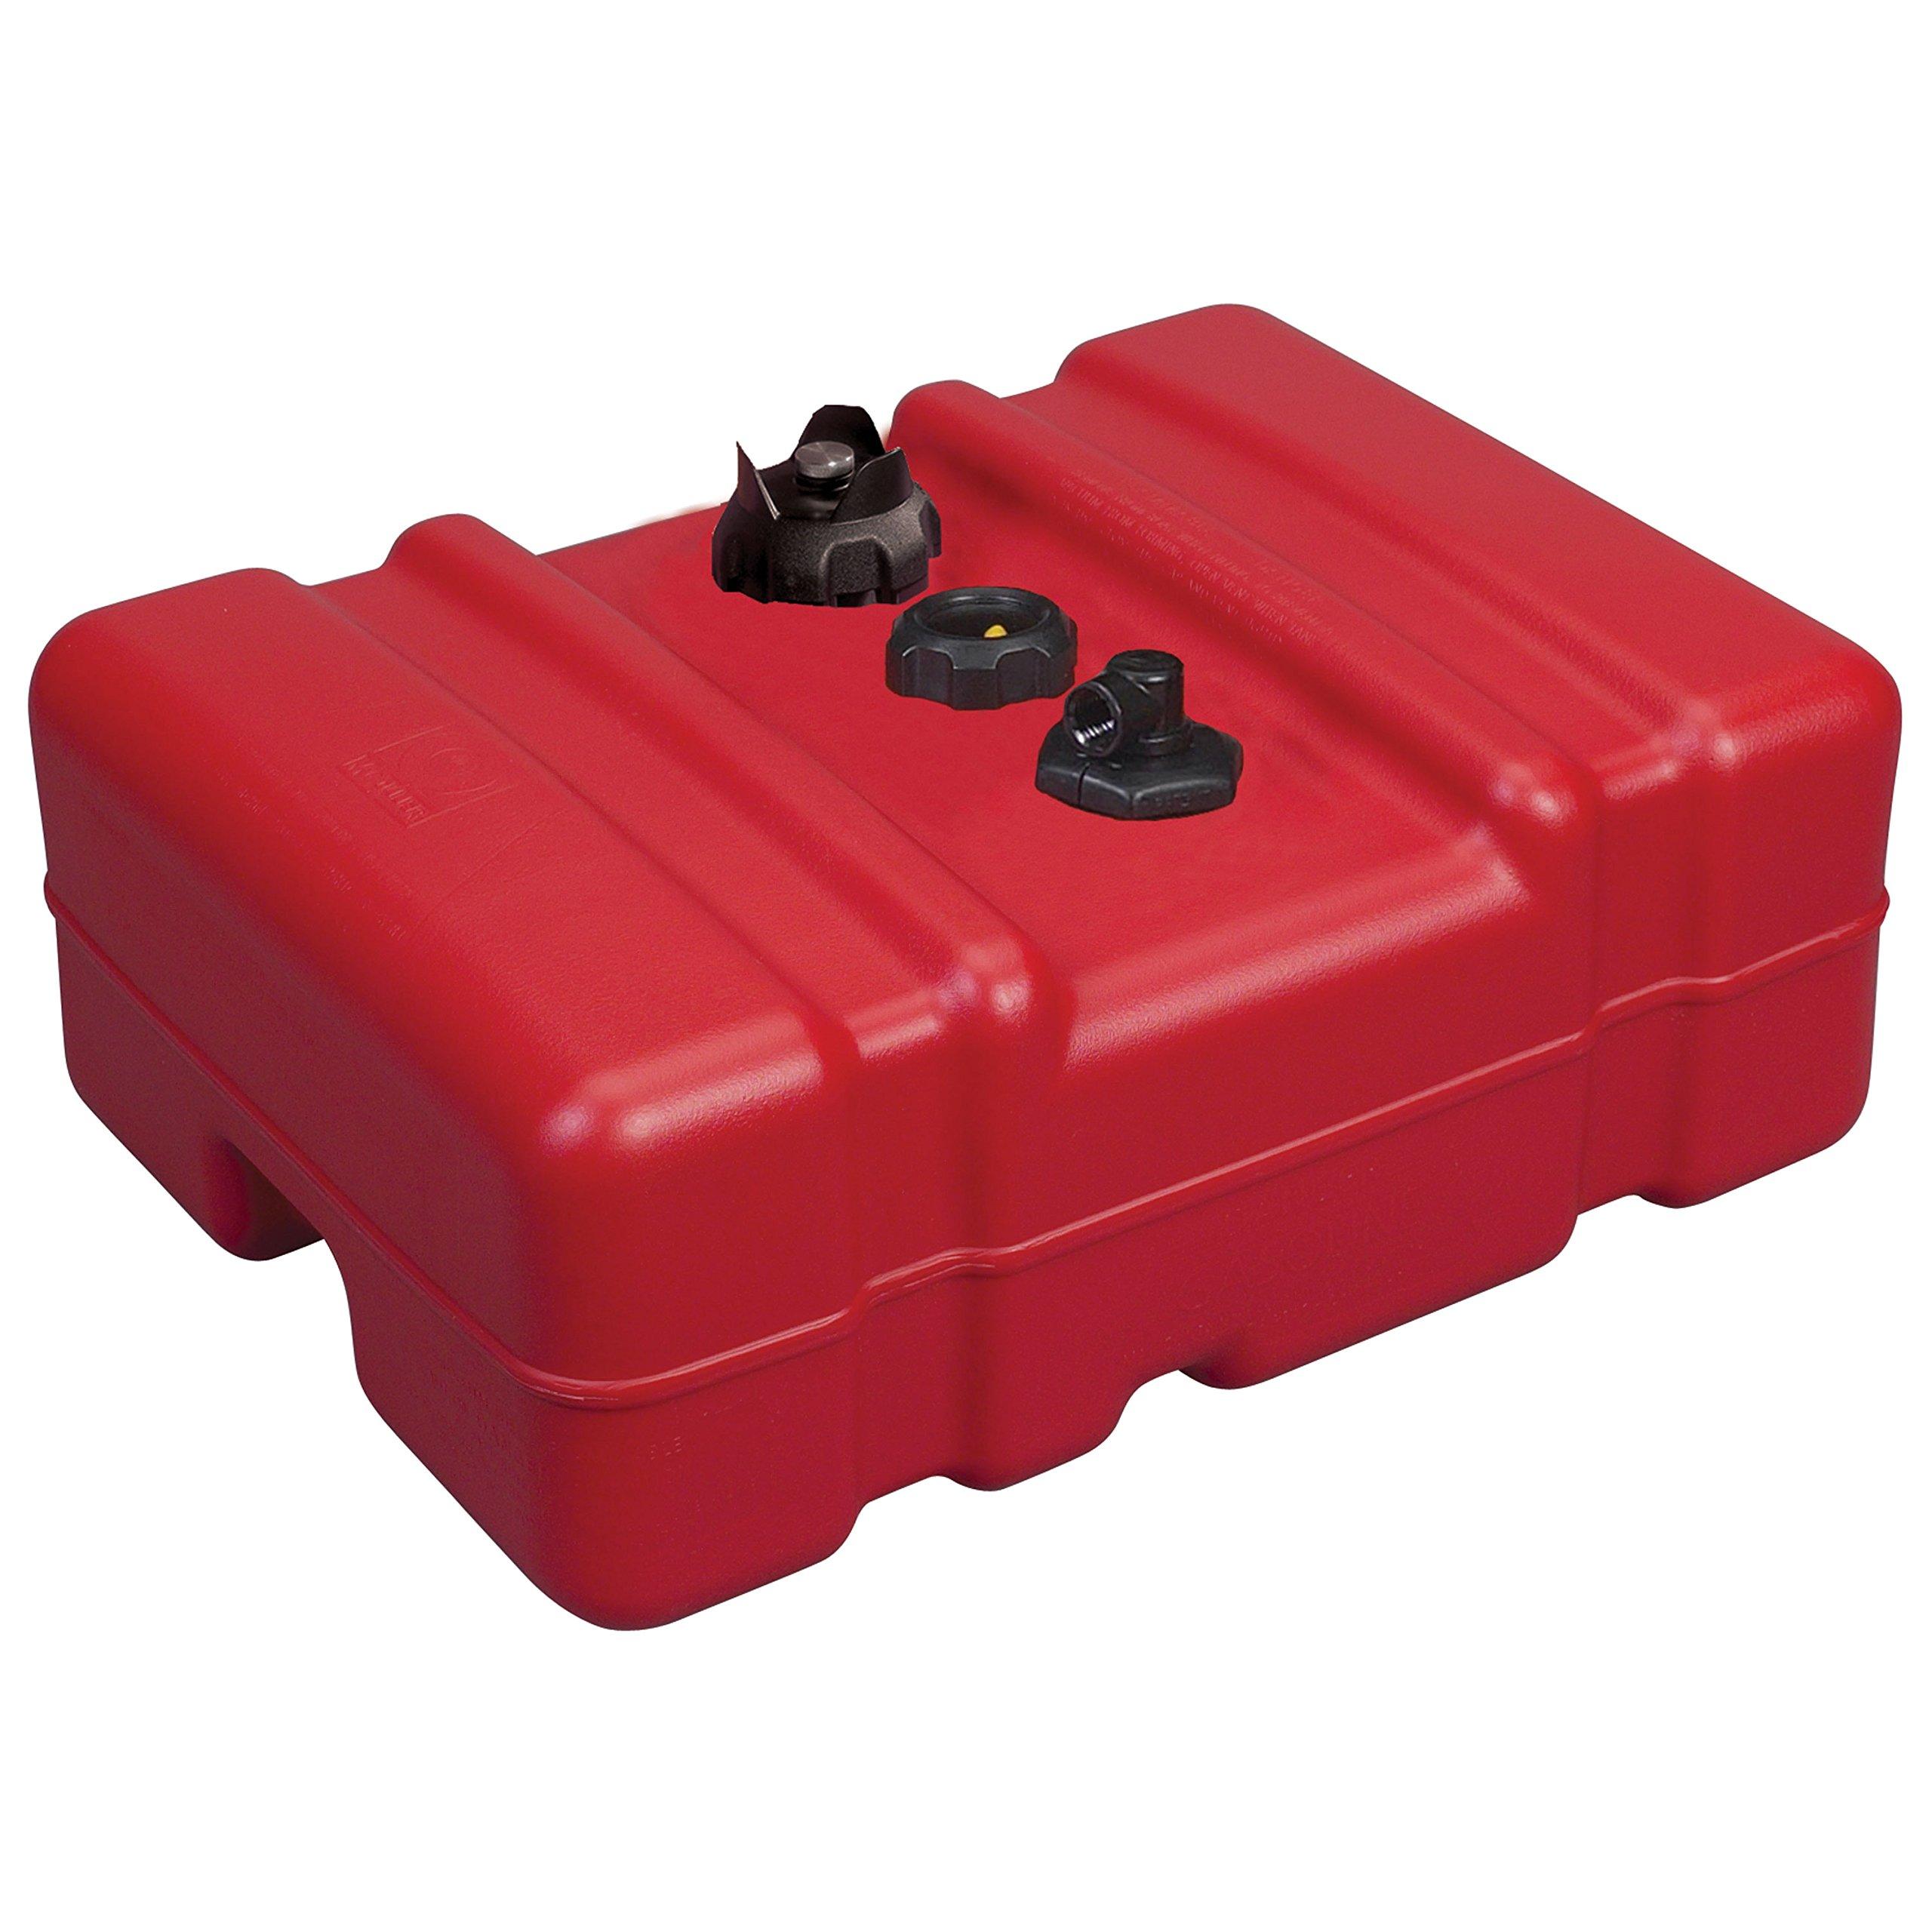 Moeller 630013LP Low Profile Portable Fuel Tank - 12 Gallon by Moeller